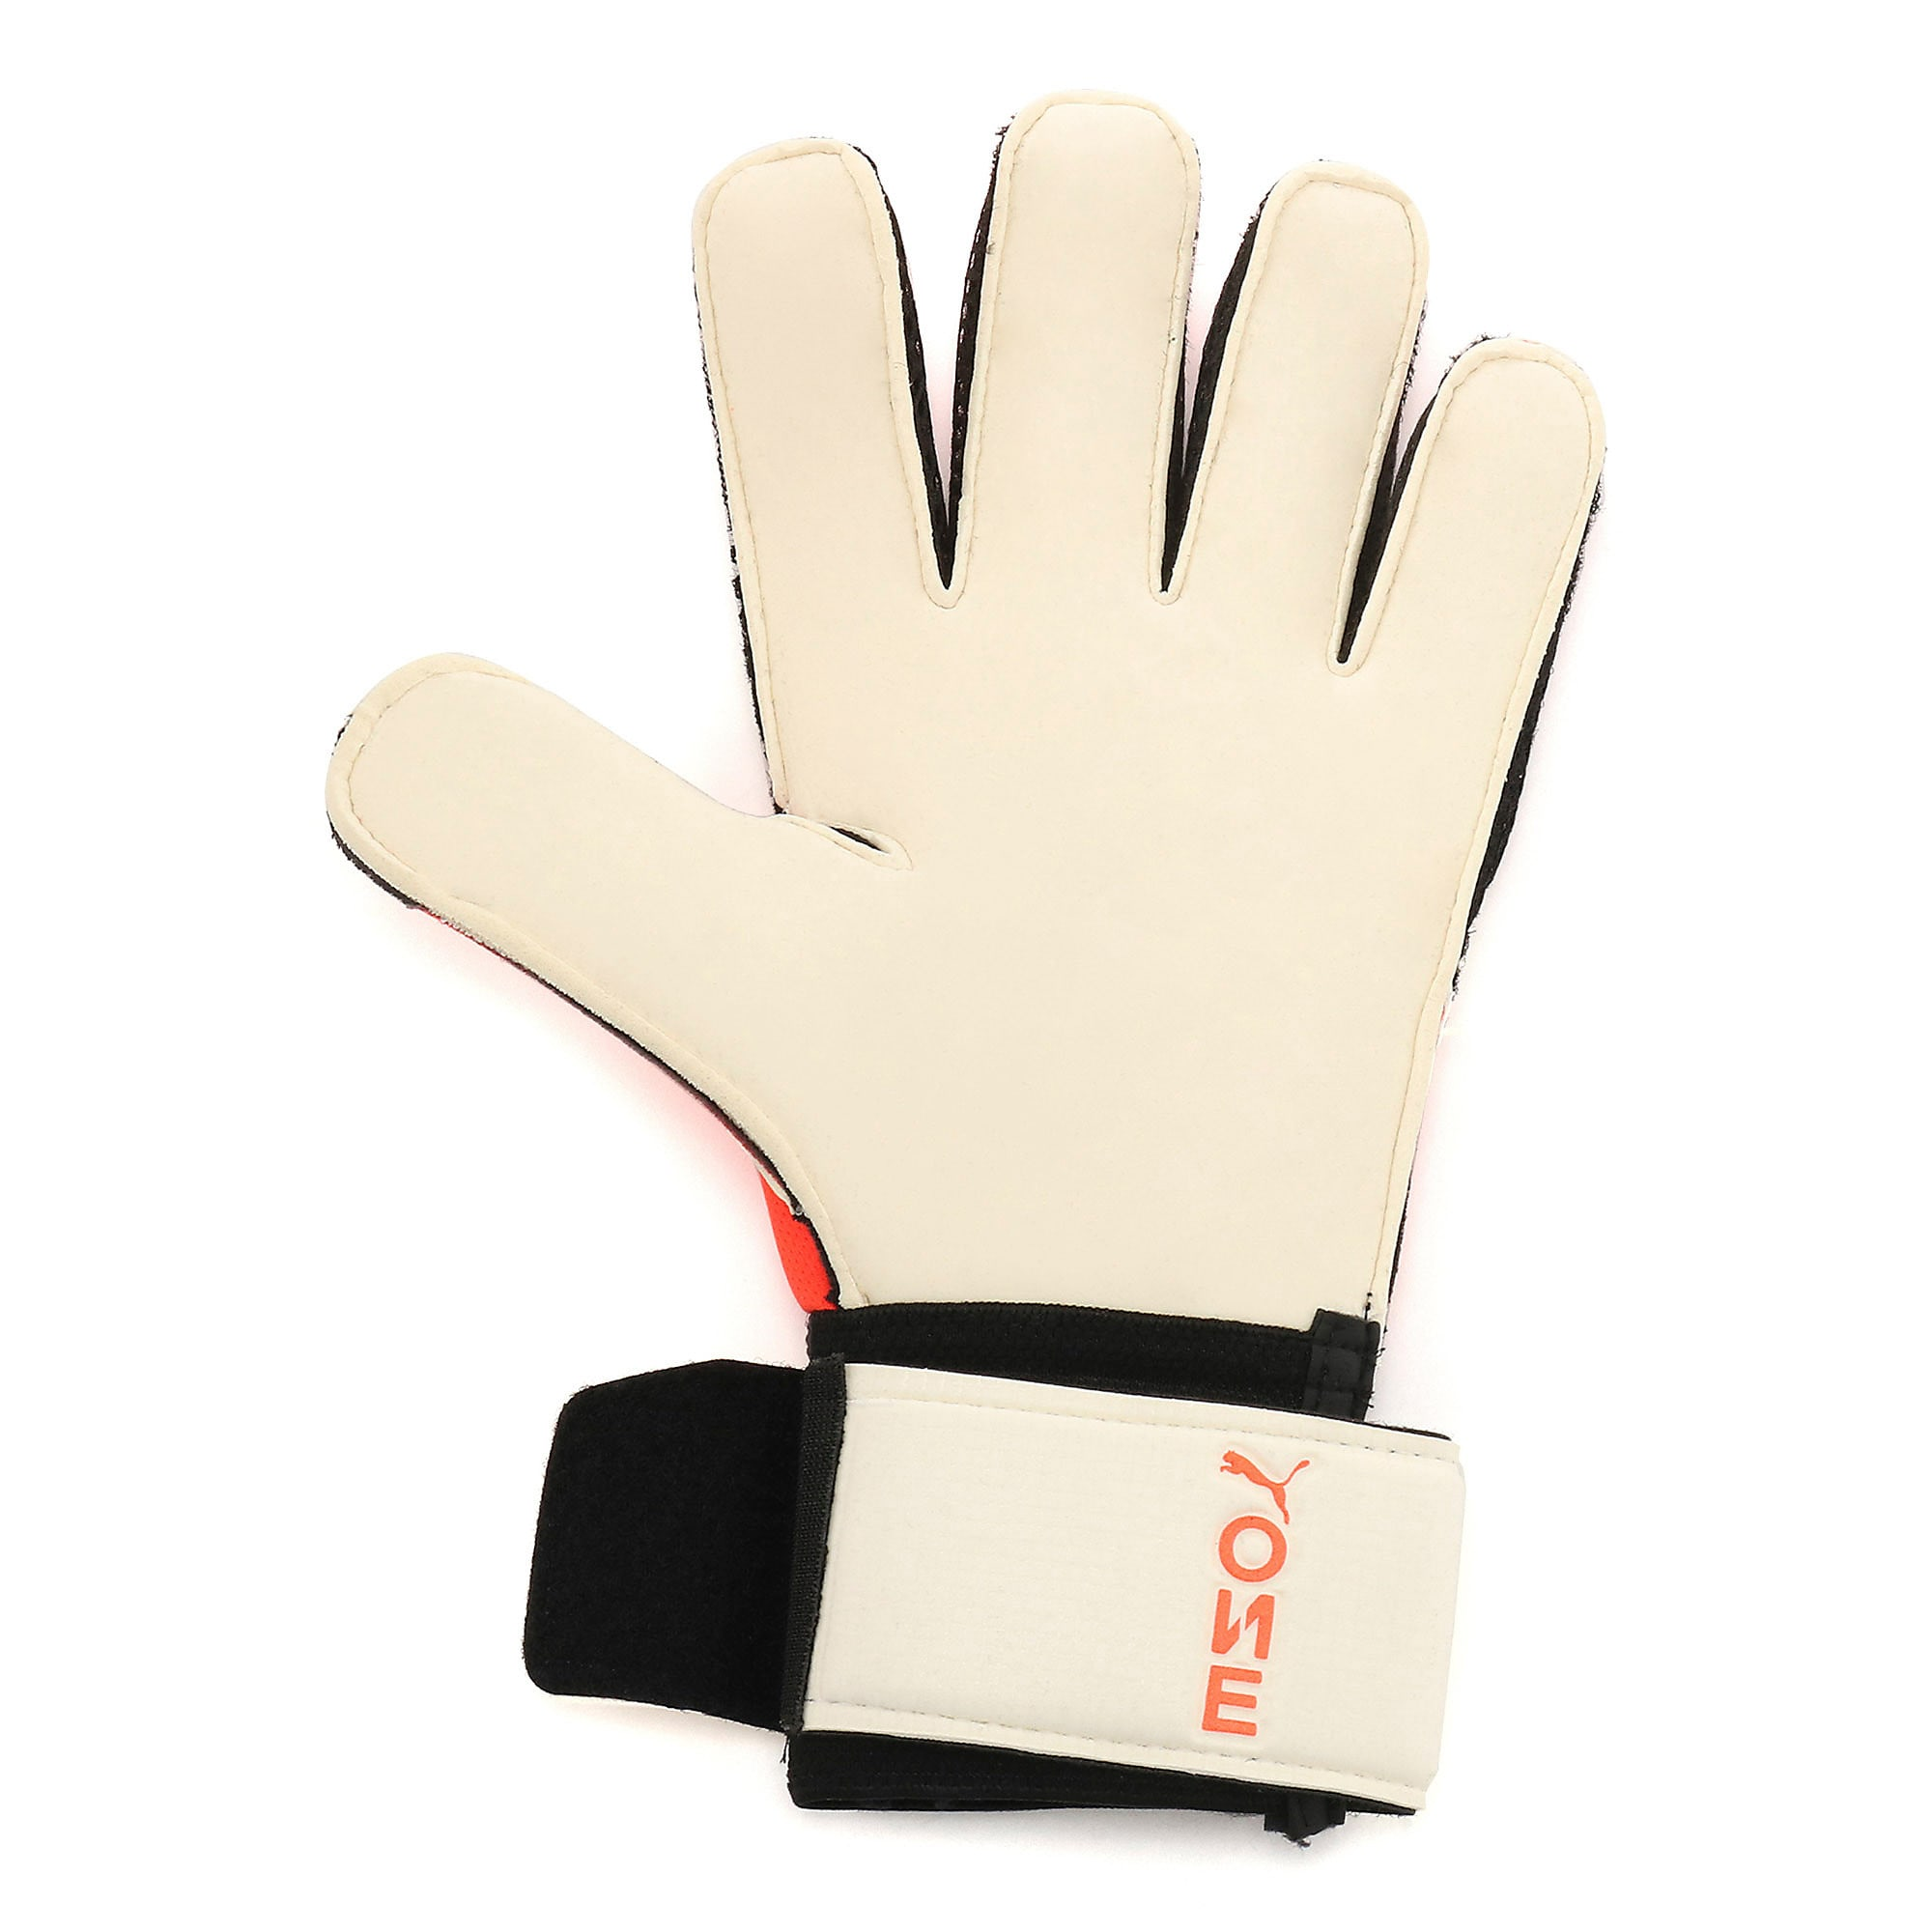 Thumbnail 2 of プーマ ワン グリップ 1 RC サッカー ゴールキーパーグローブ, Nrgy Red-Black-Puma White, medium-JPN